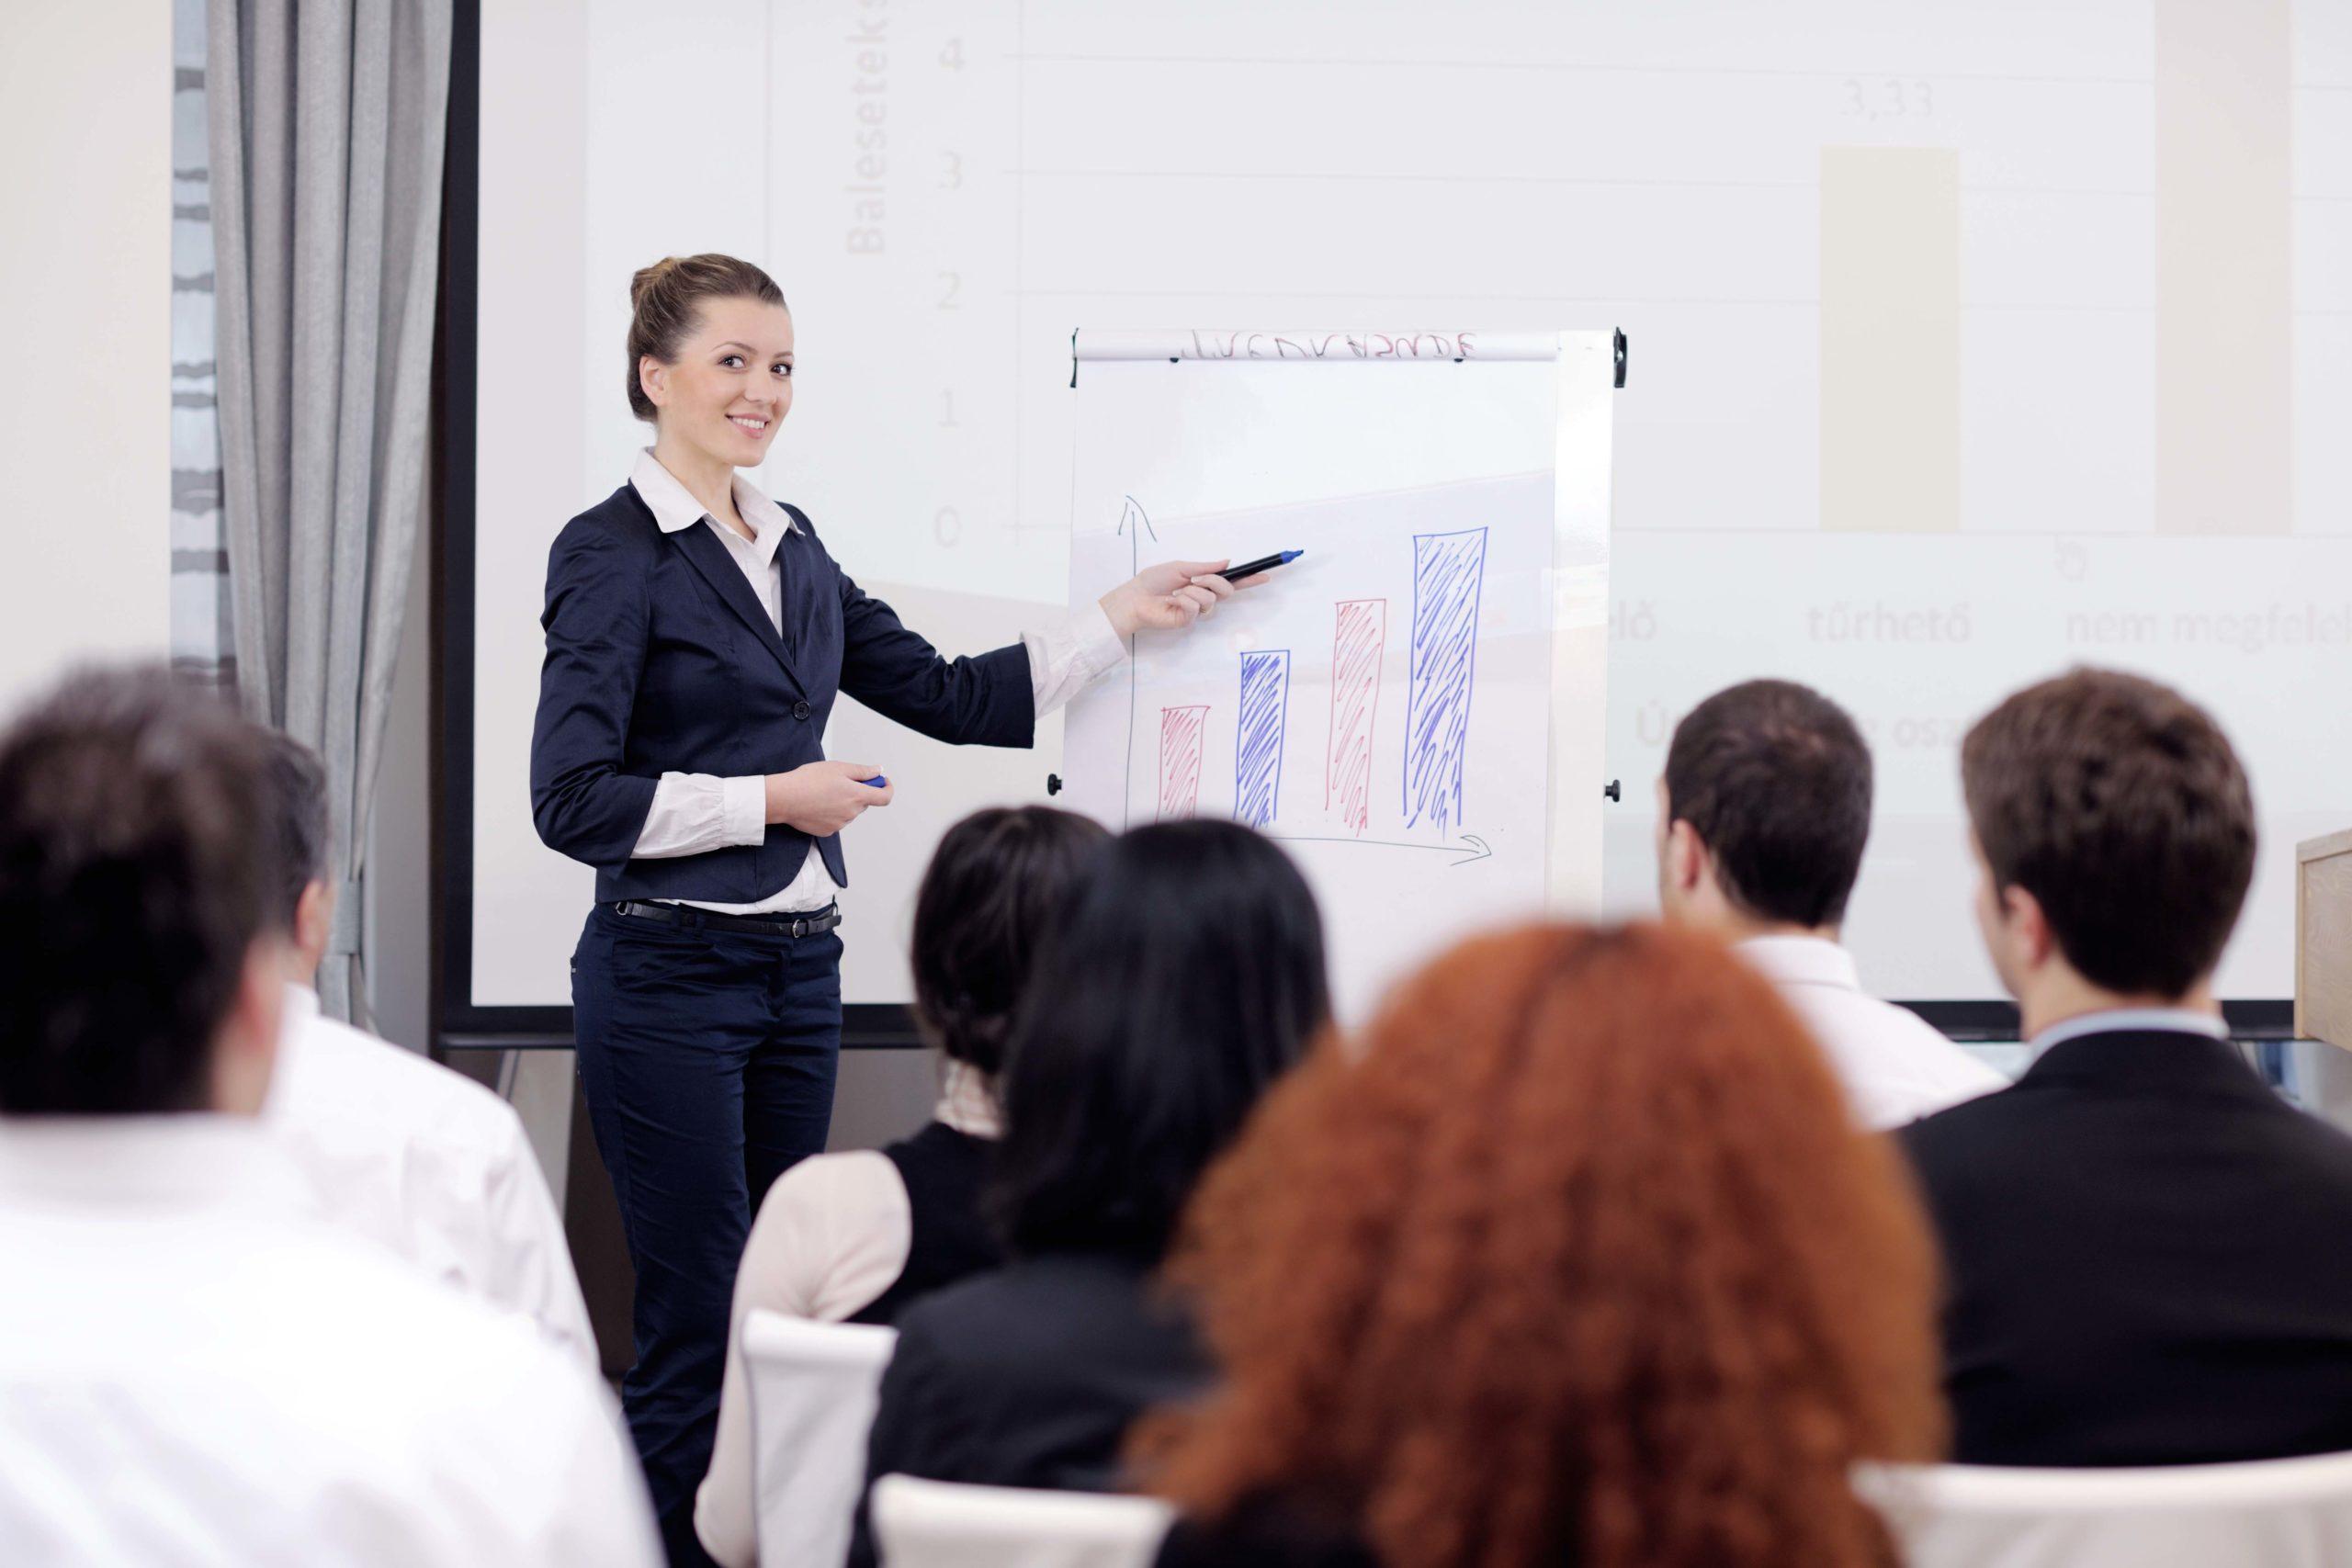 UofA Board Internship Program Workshop - Person Presenting Data to an Audience